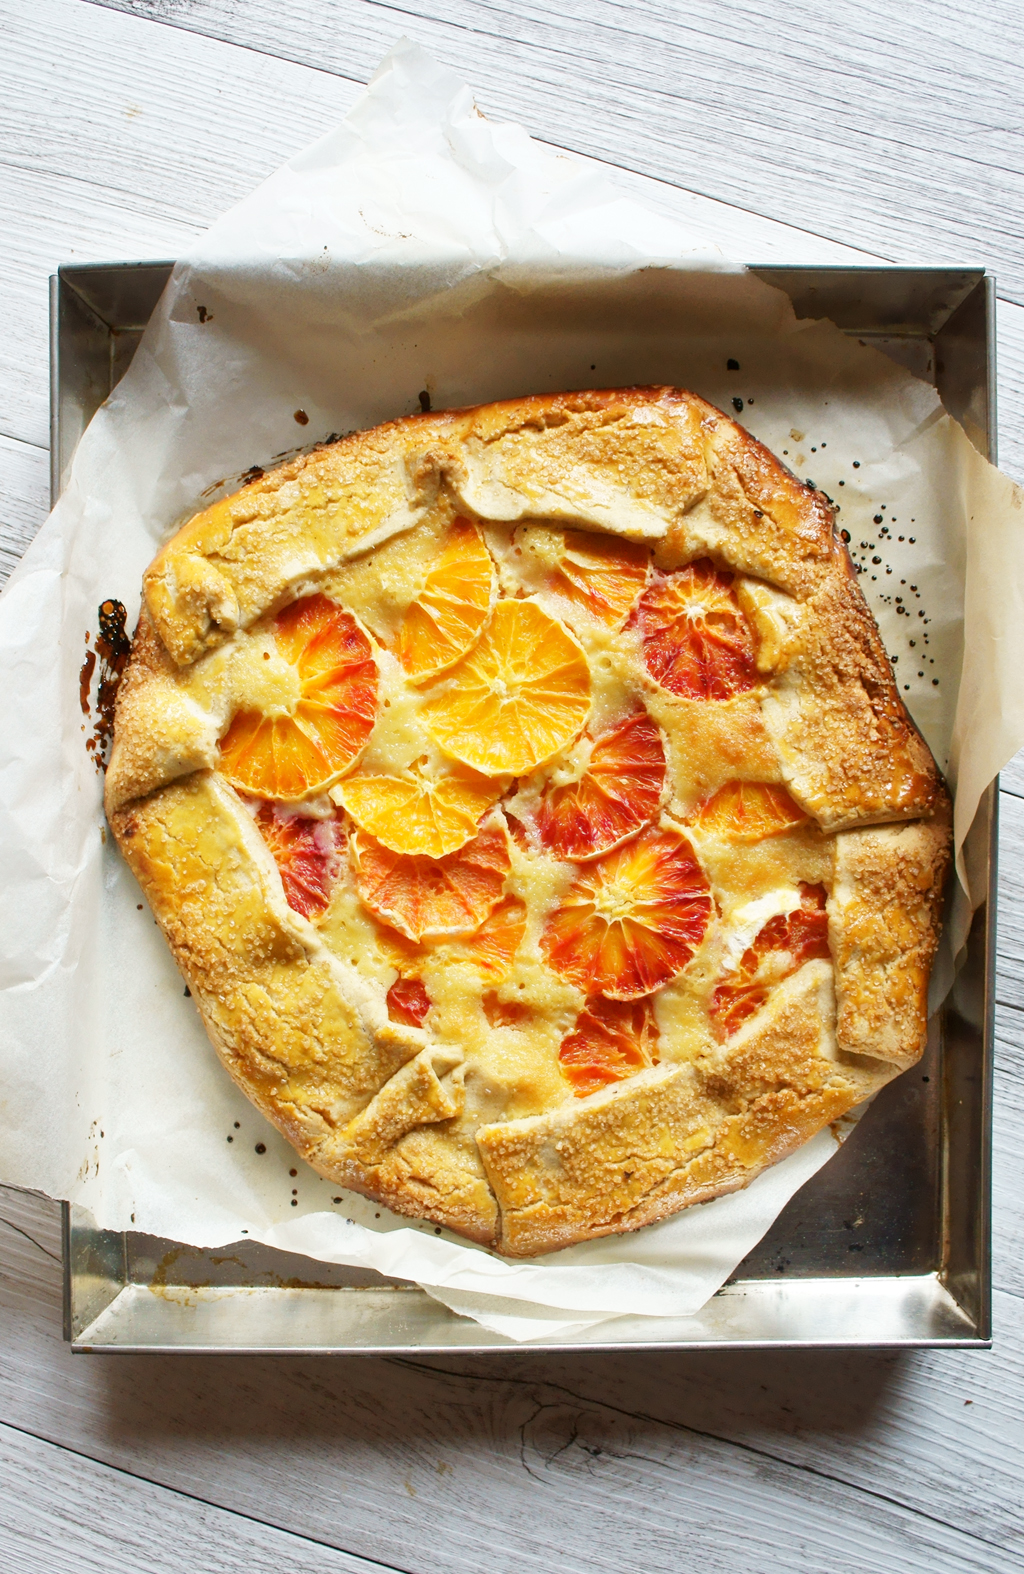 Tarte-rustique-all'arancia-e-crema-di-mandorle